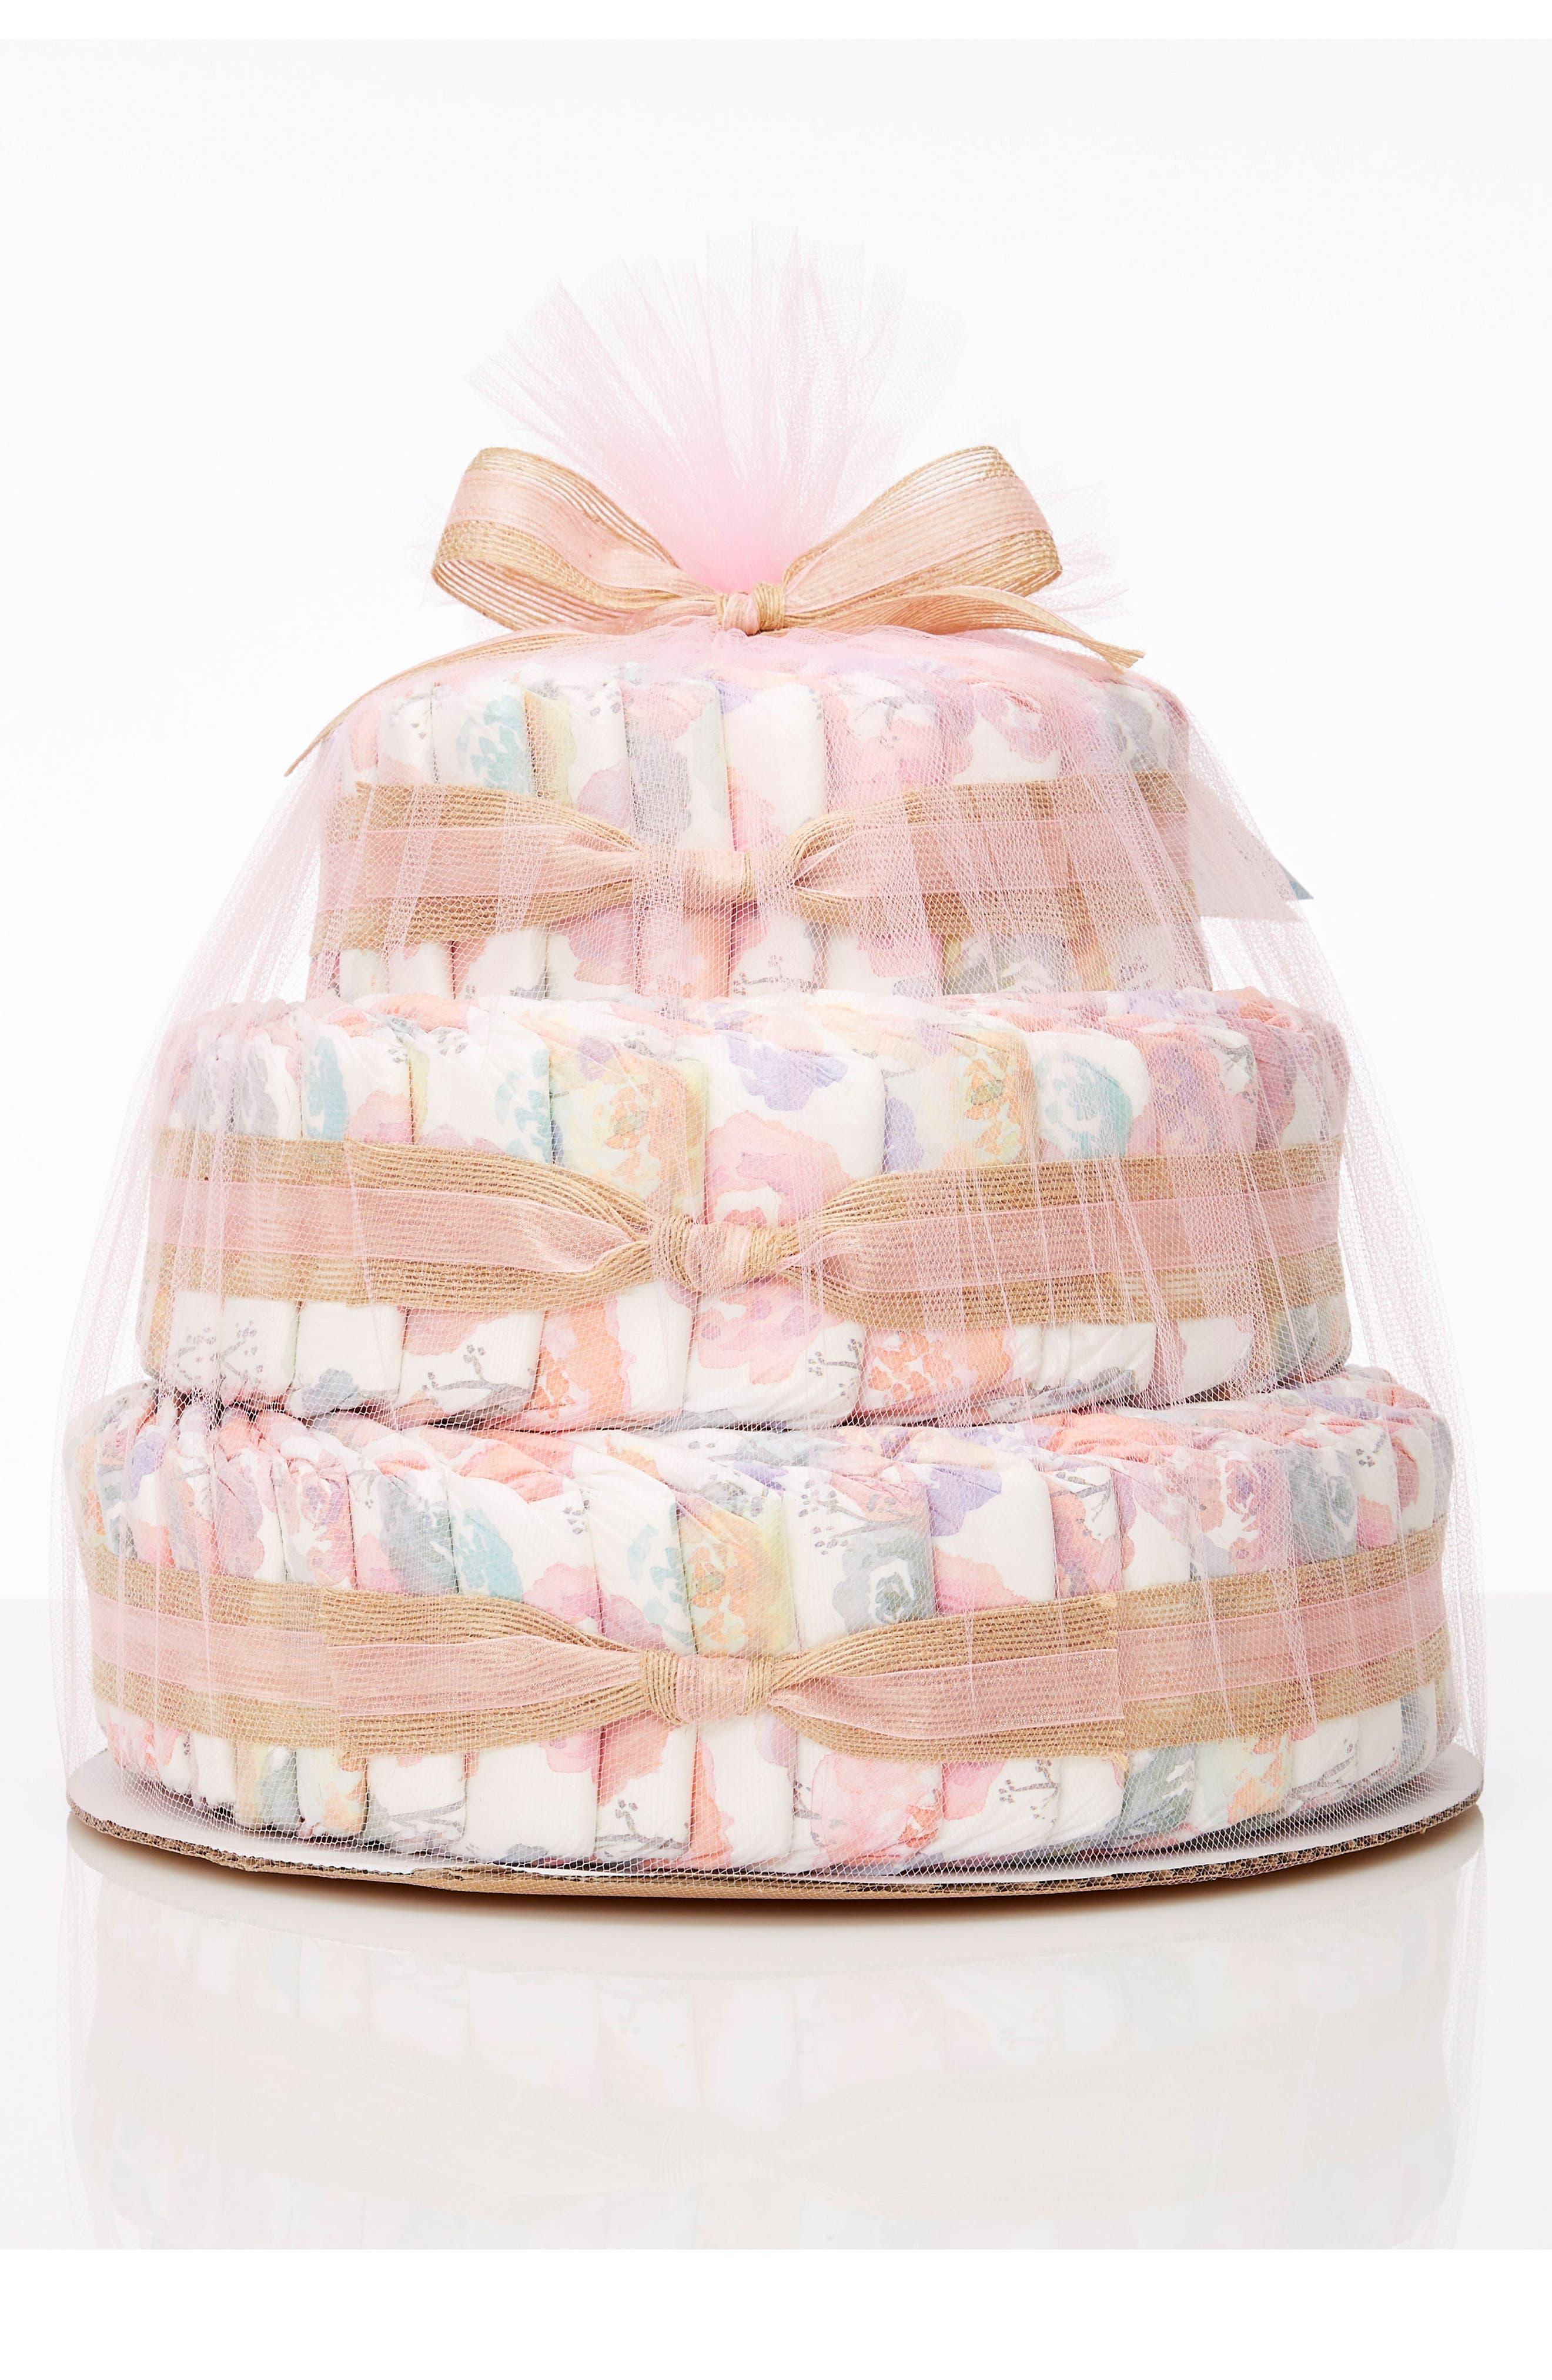 Large Diaper Cake & Full-Size Essentials Set,                         Main,                         color, Rose Blossom